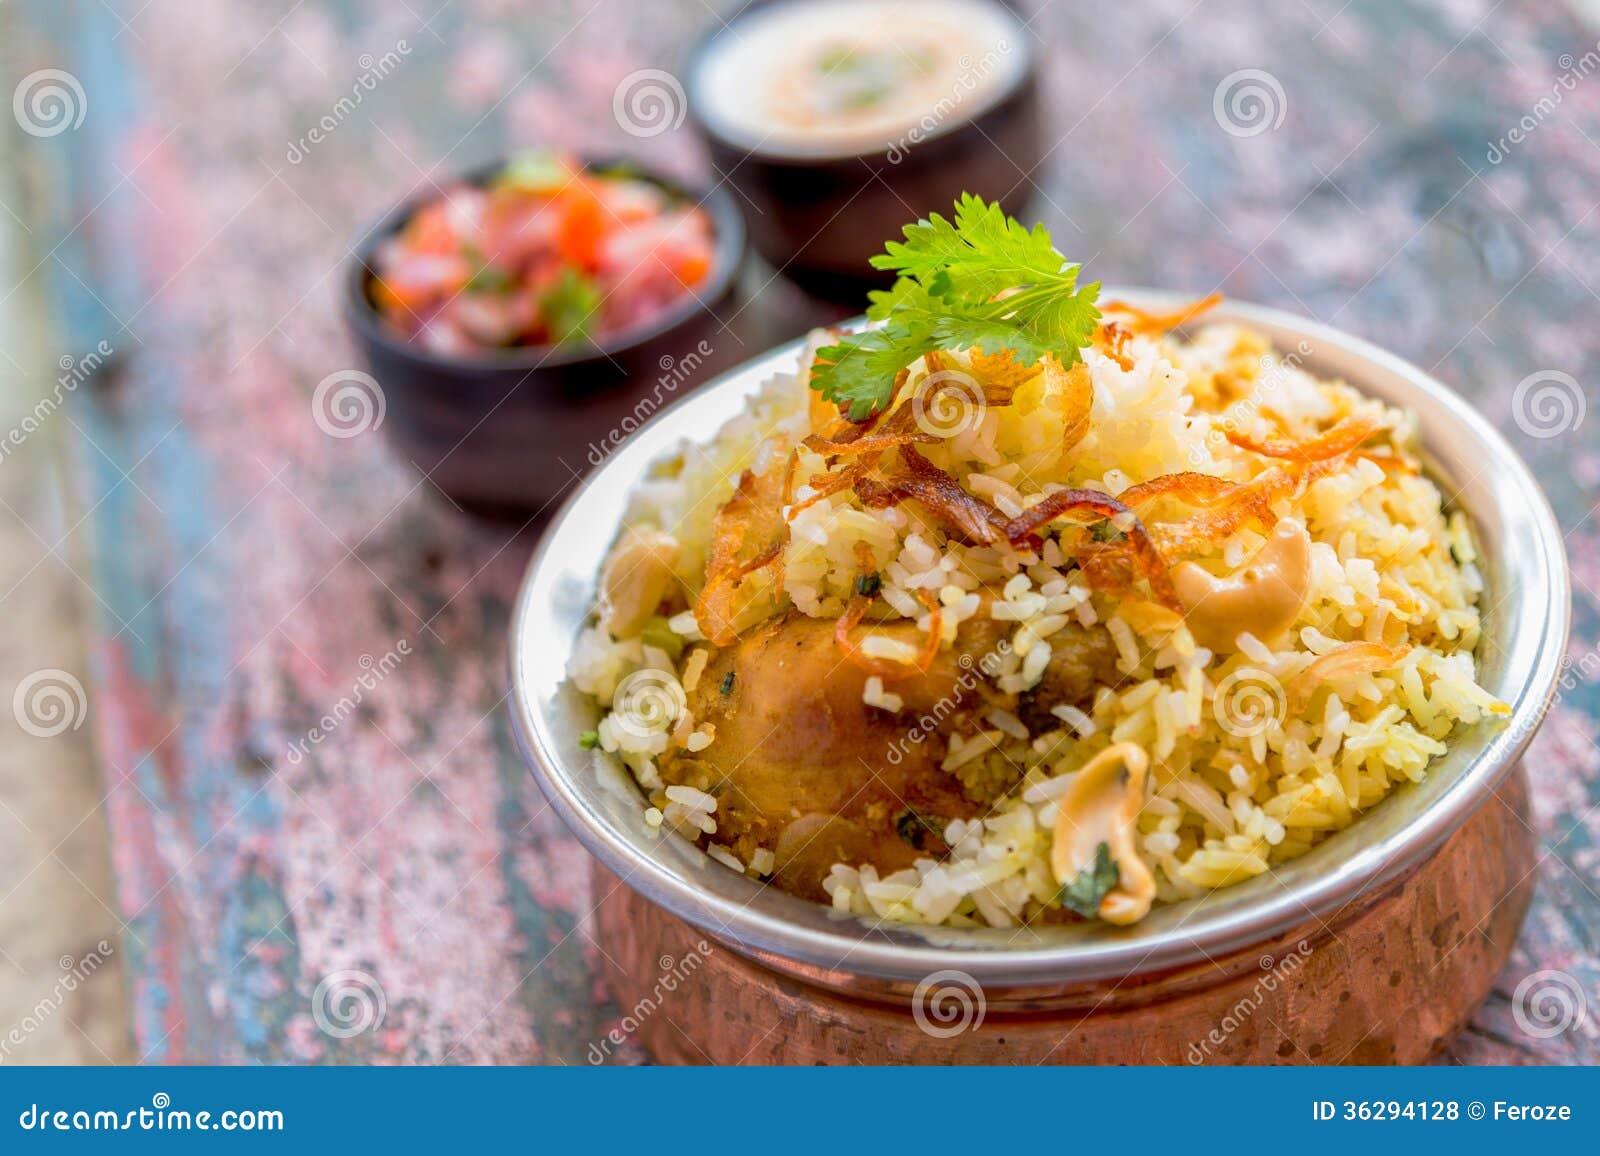 Chicken Biryani Royalty Free Stock Photos Image 36294128